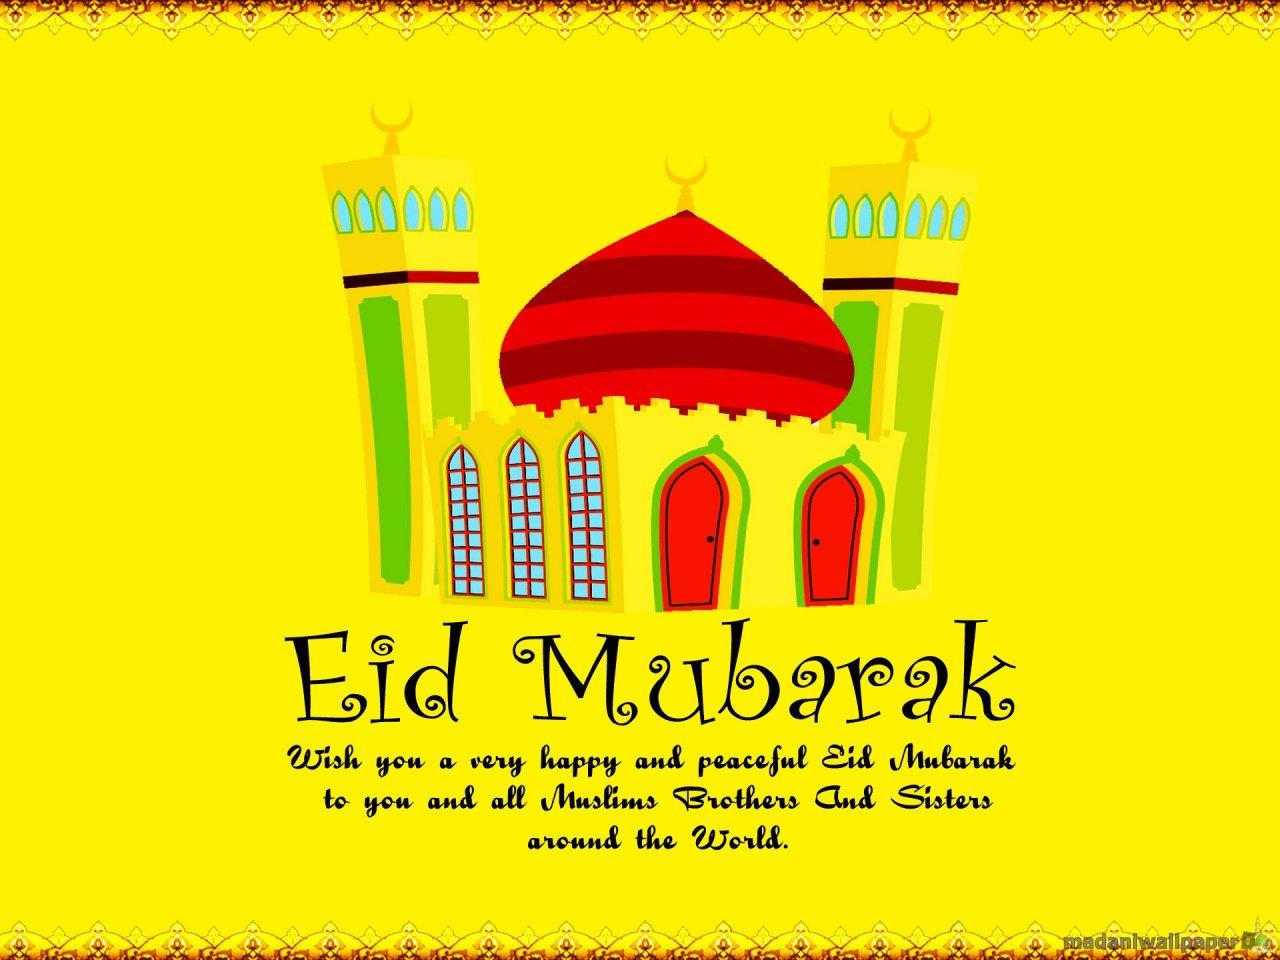 Eid mubarak one and all buzz ideazz kristyandbryce Images